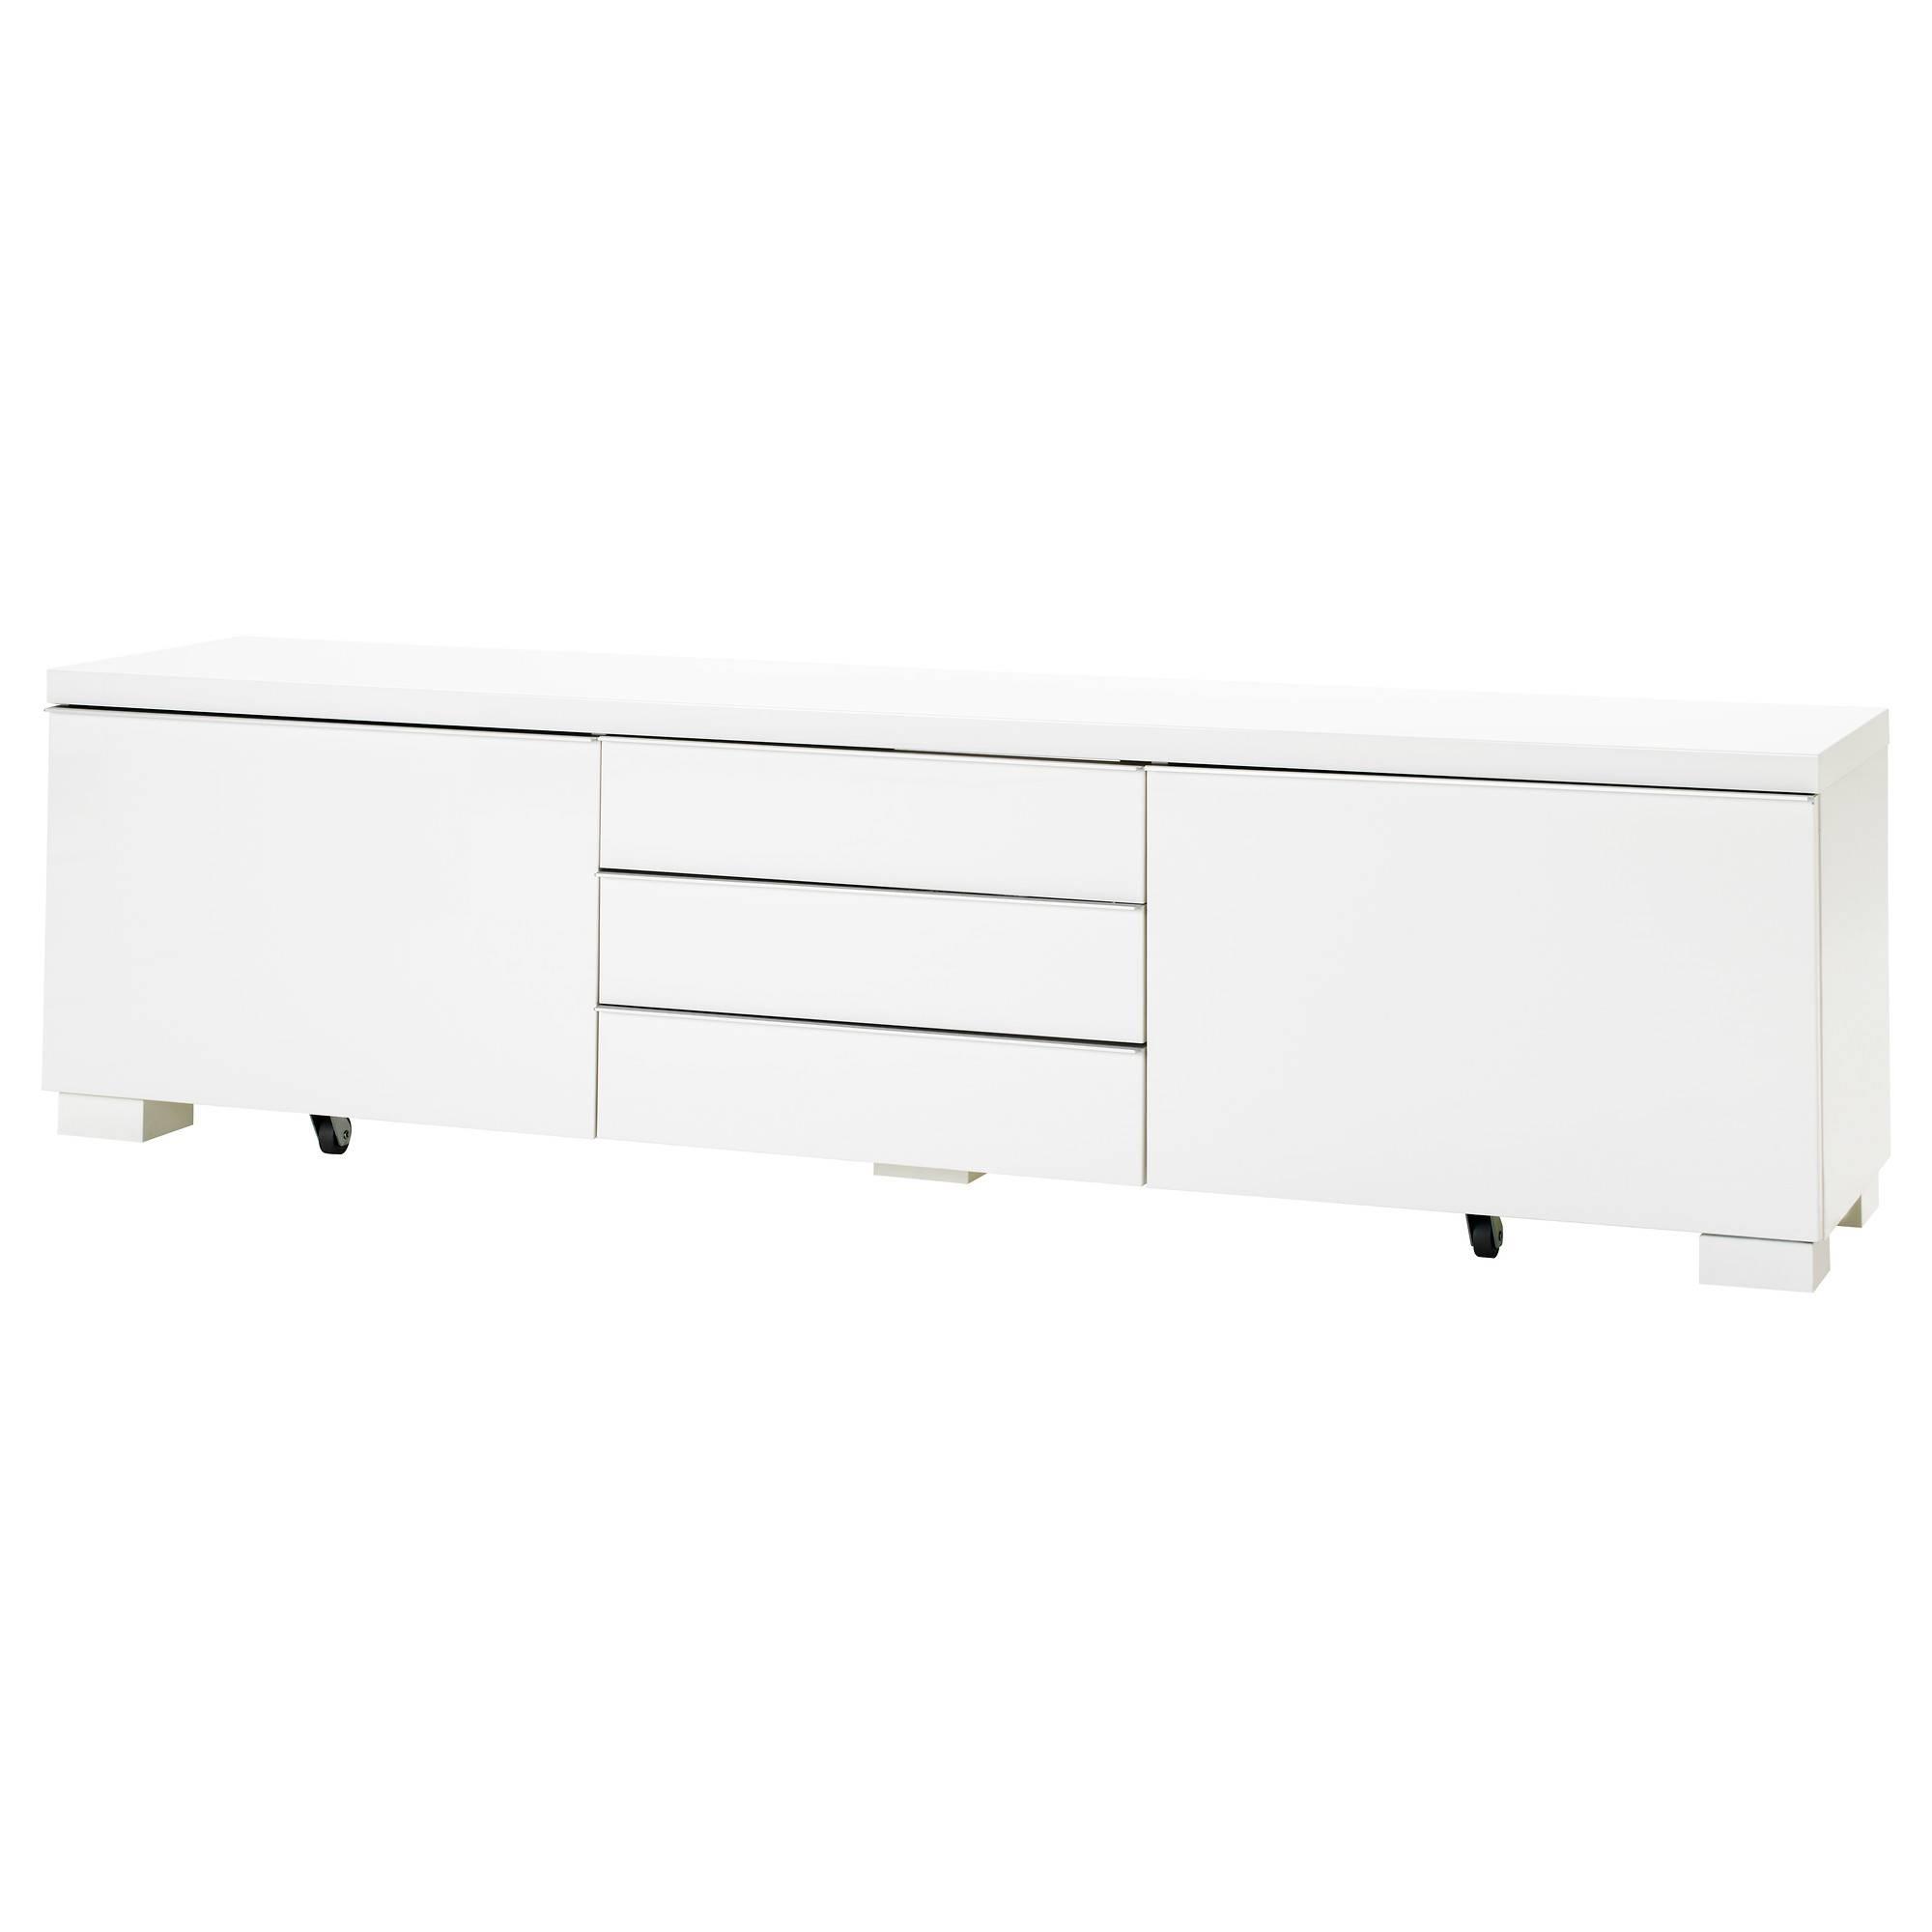 Bestå Burs Tv Bench High-Gloss White 180X41 Cm - Ikea for White Gloss Ikea Sideboards (Image 2 of 15)